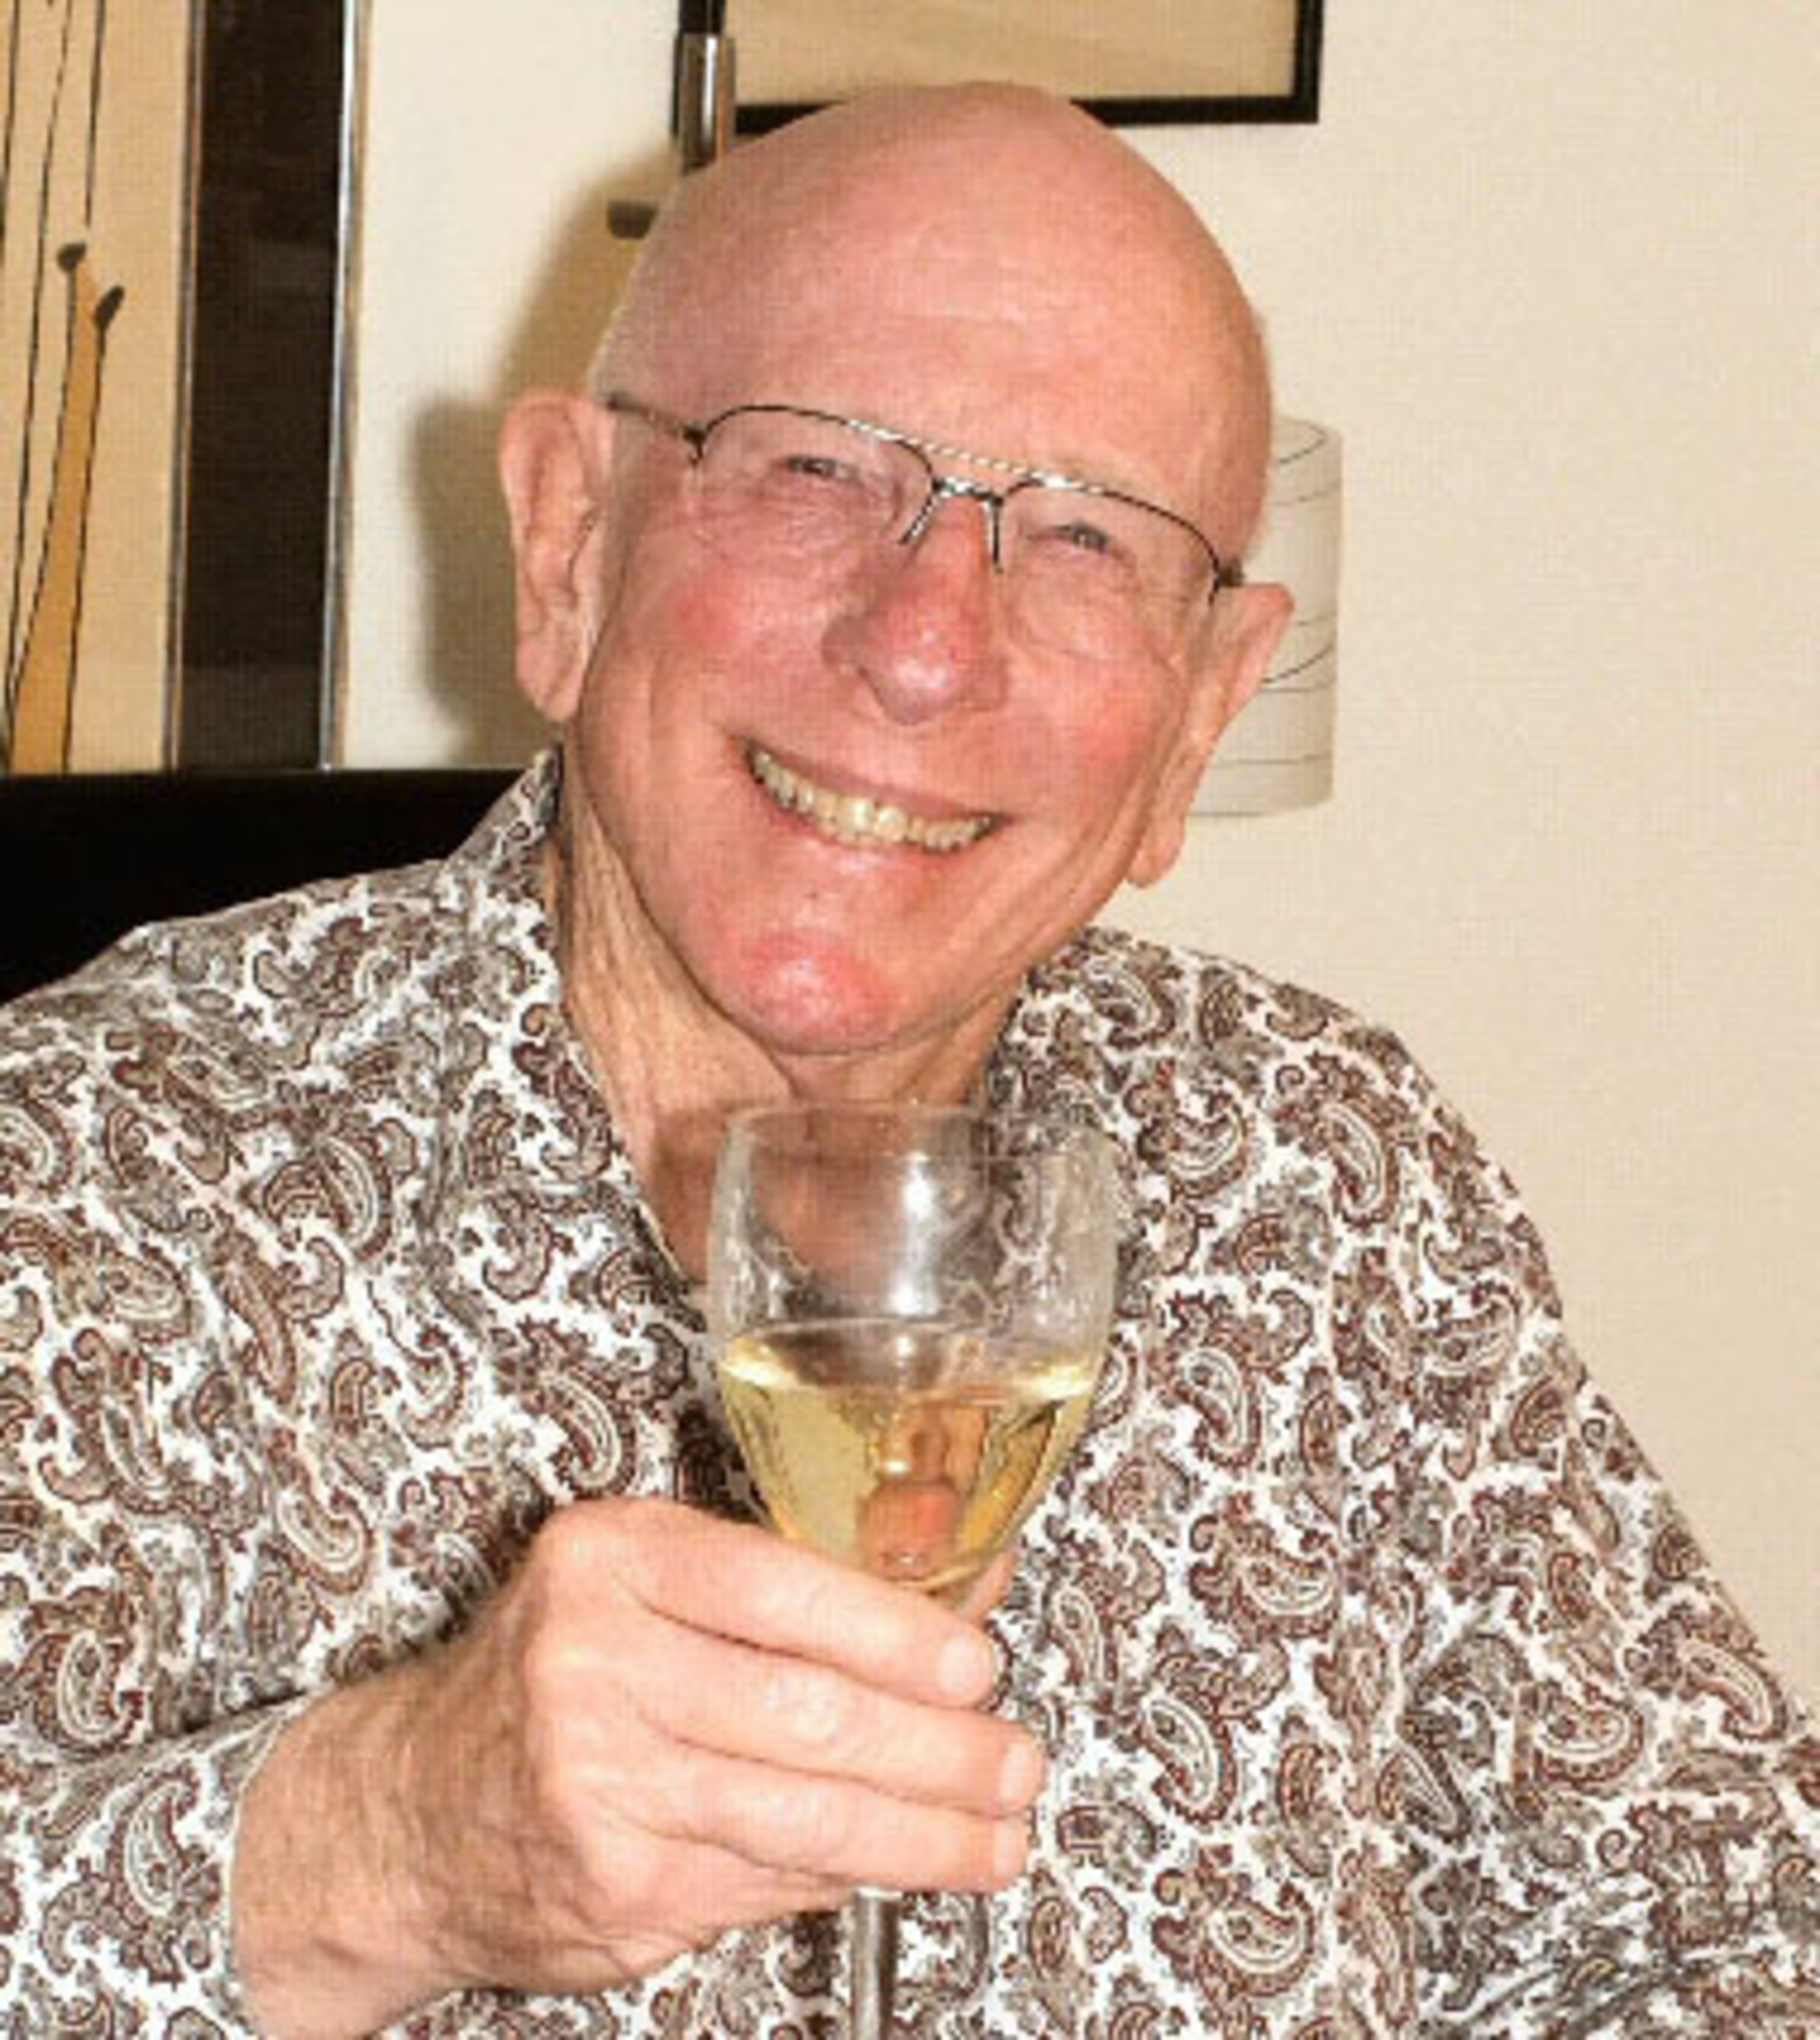 Charles Delmar. (PRNewsFoto/My Cooking Coach) (PRNewsFoto/MY COOKING COACH)